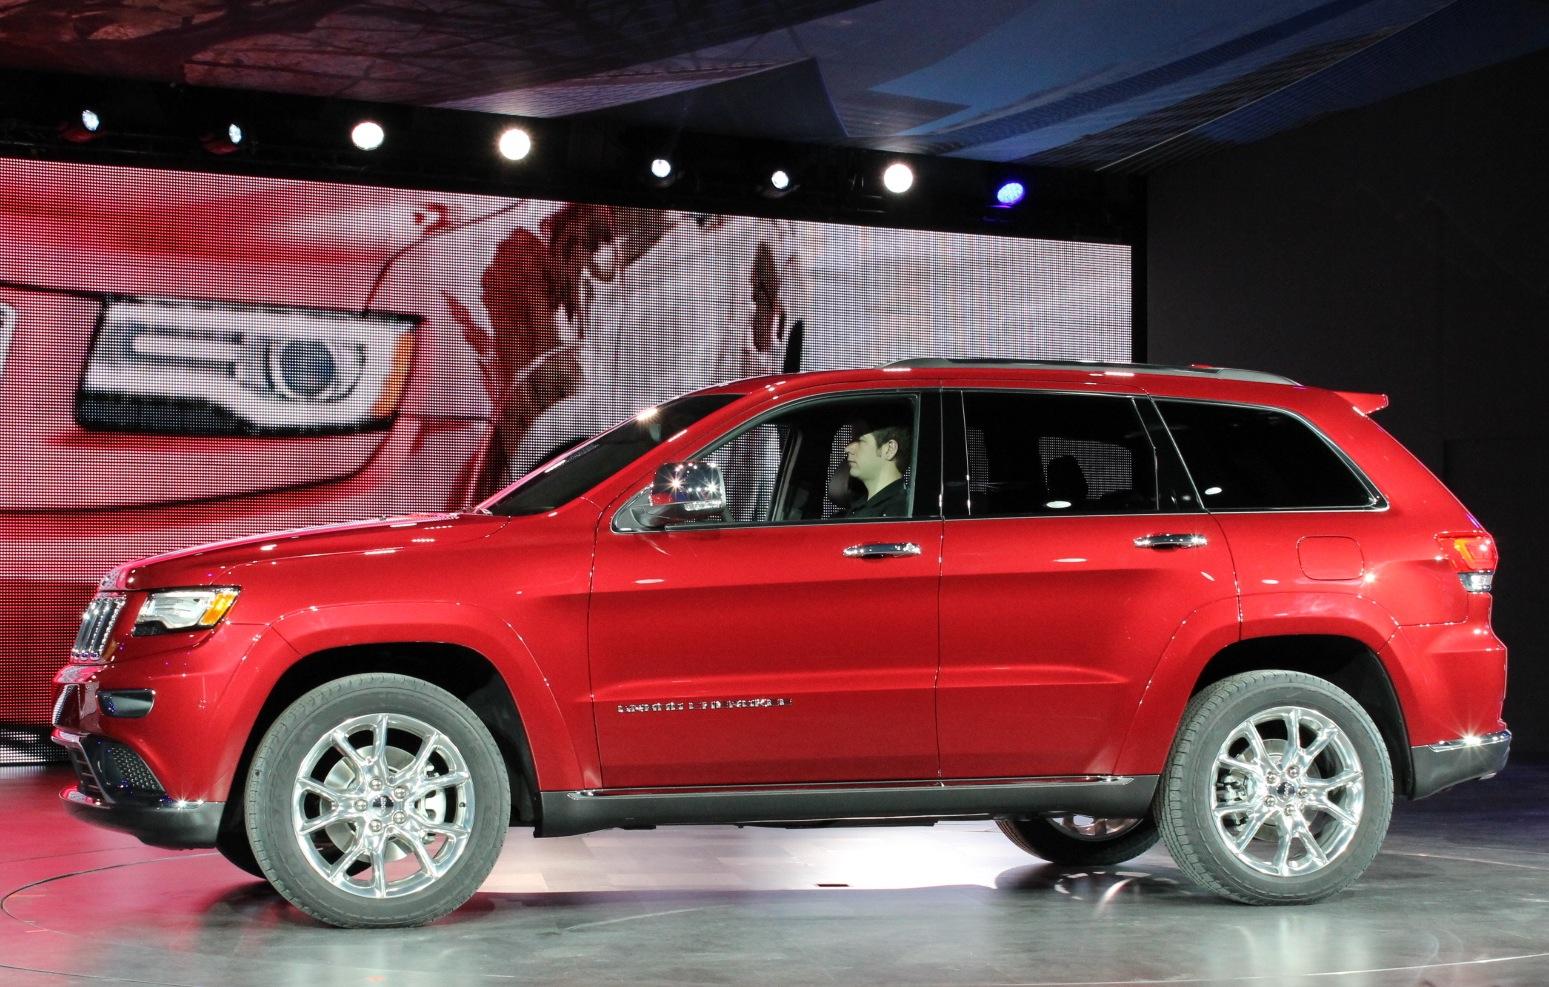 2014 jeep grand cherokee high mpg diesel eight speeds. Black Bedroom Furniture Sets. Home Design Ideas